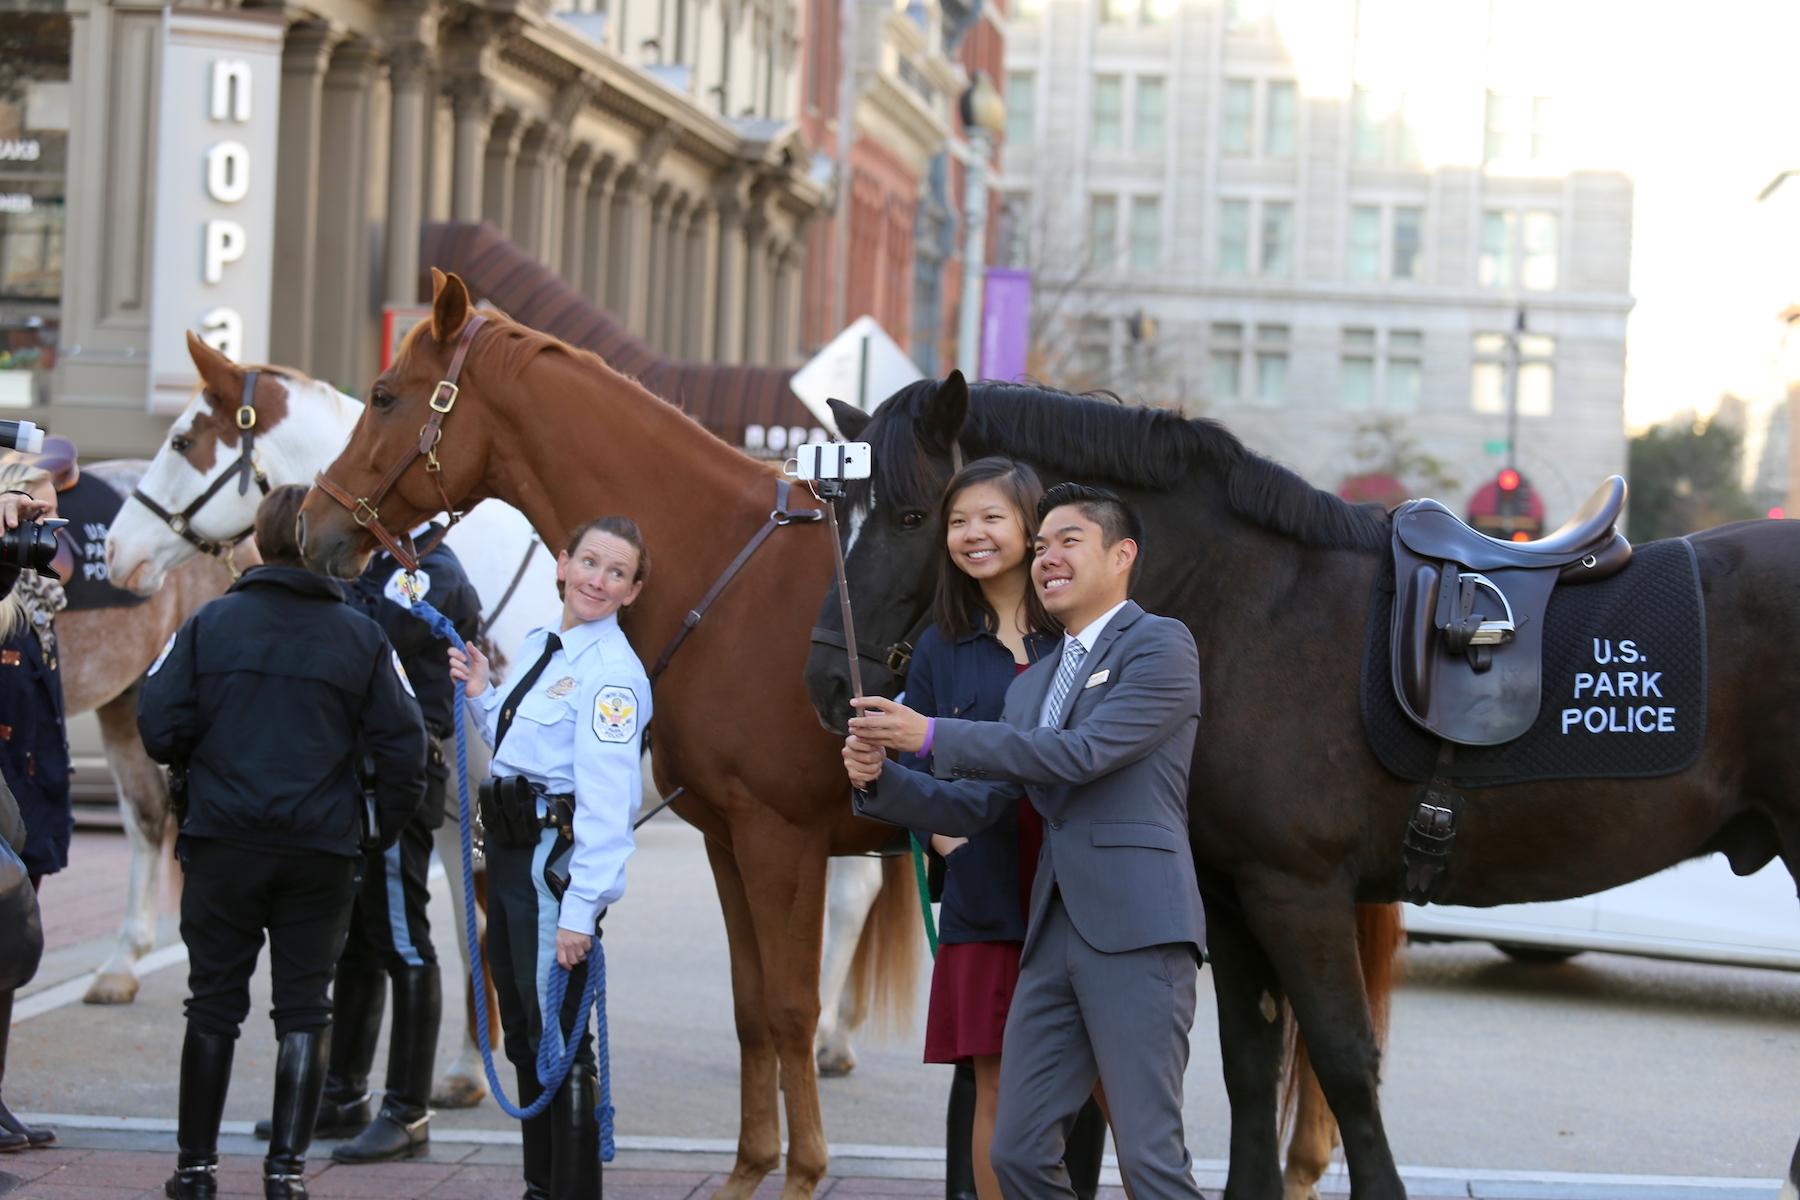 Washington International Horse Show Expands First